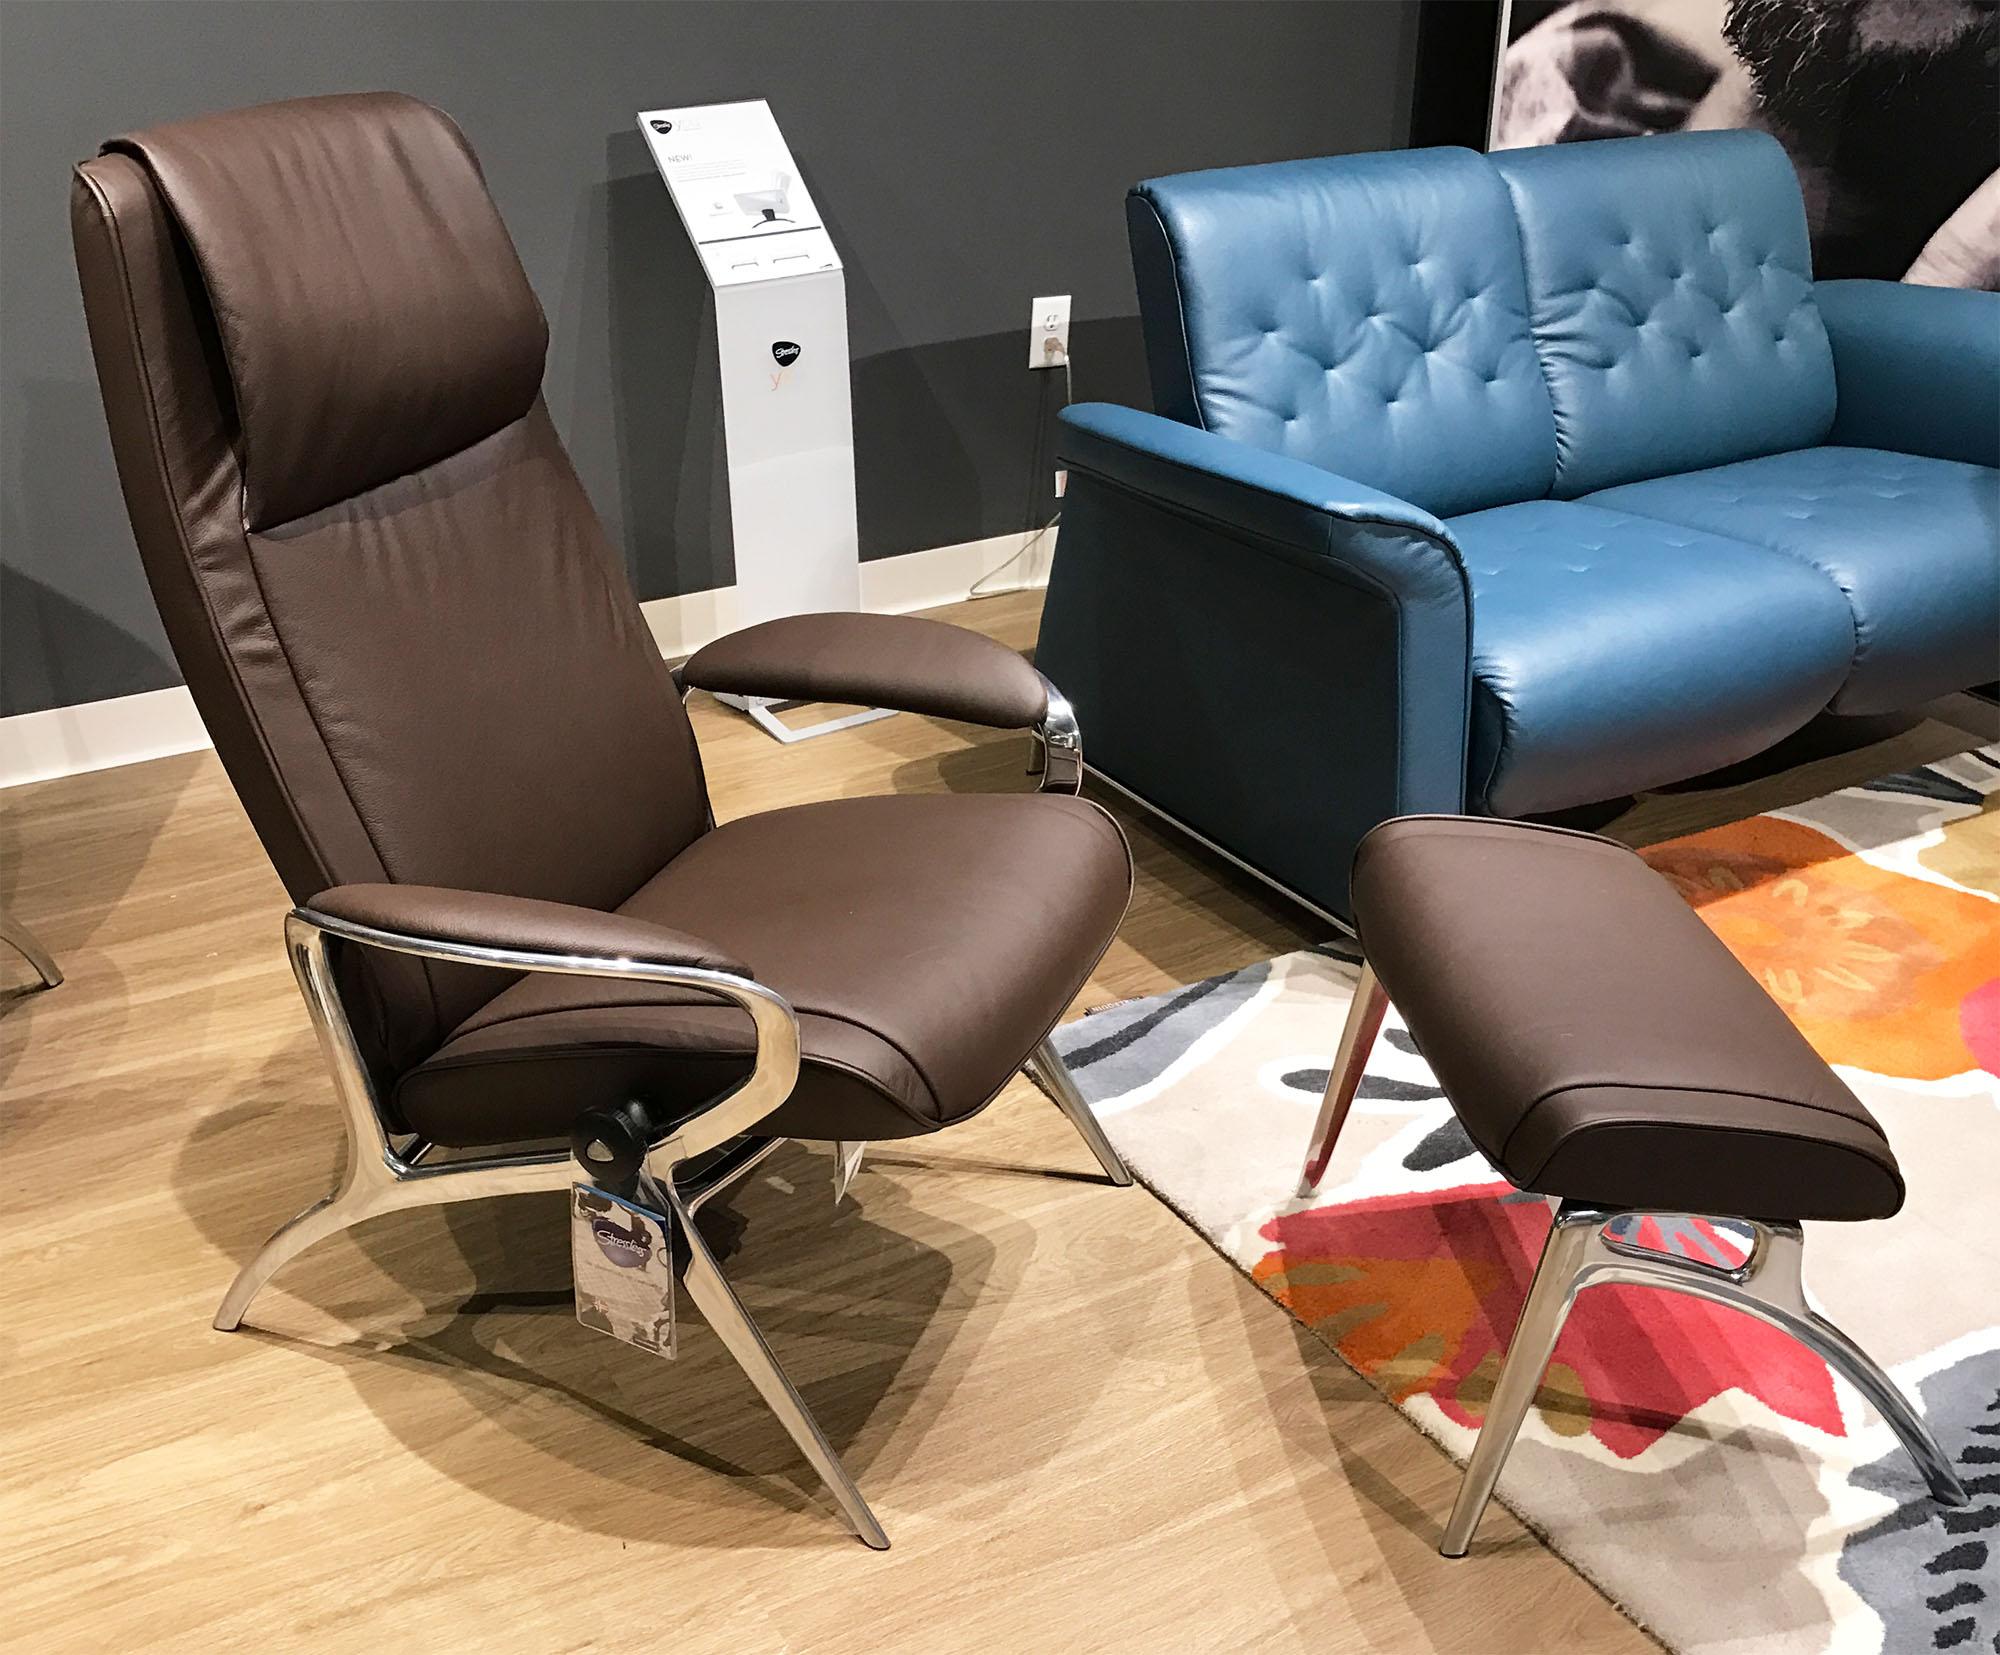 stressless you james aluminum recliner chair in batick. Black Bedroom Furniture Sets. Home Design Ideas